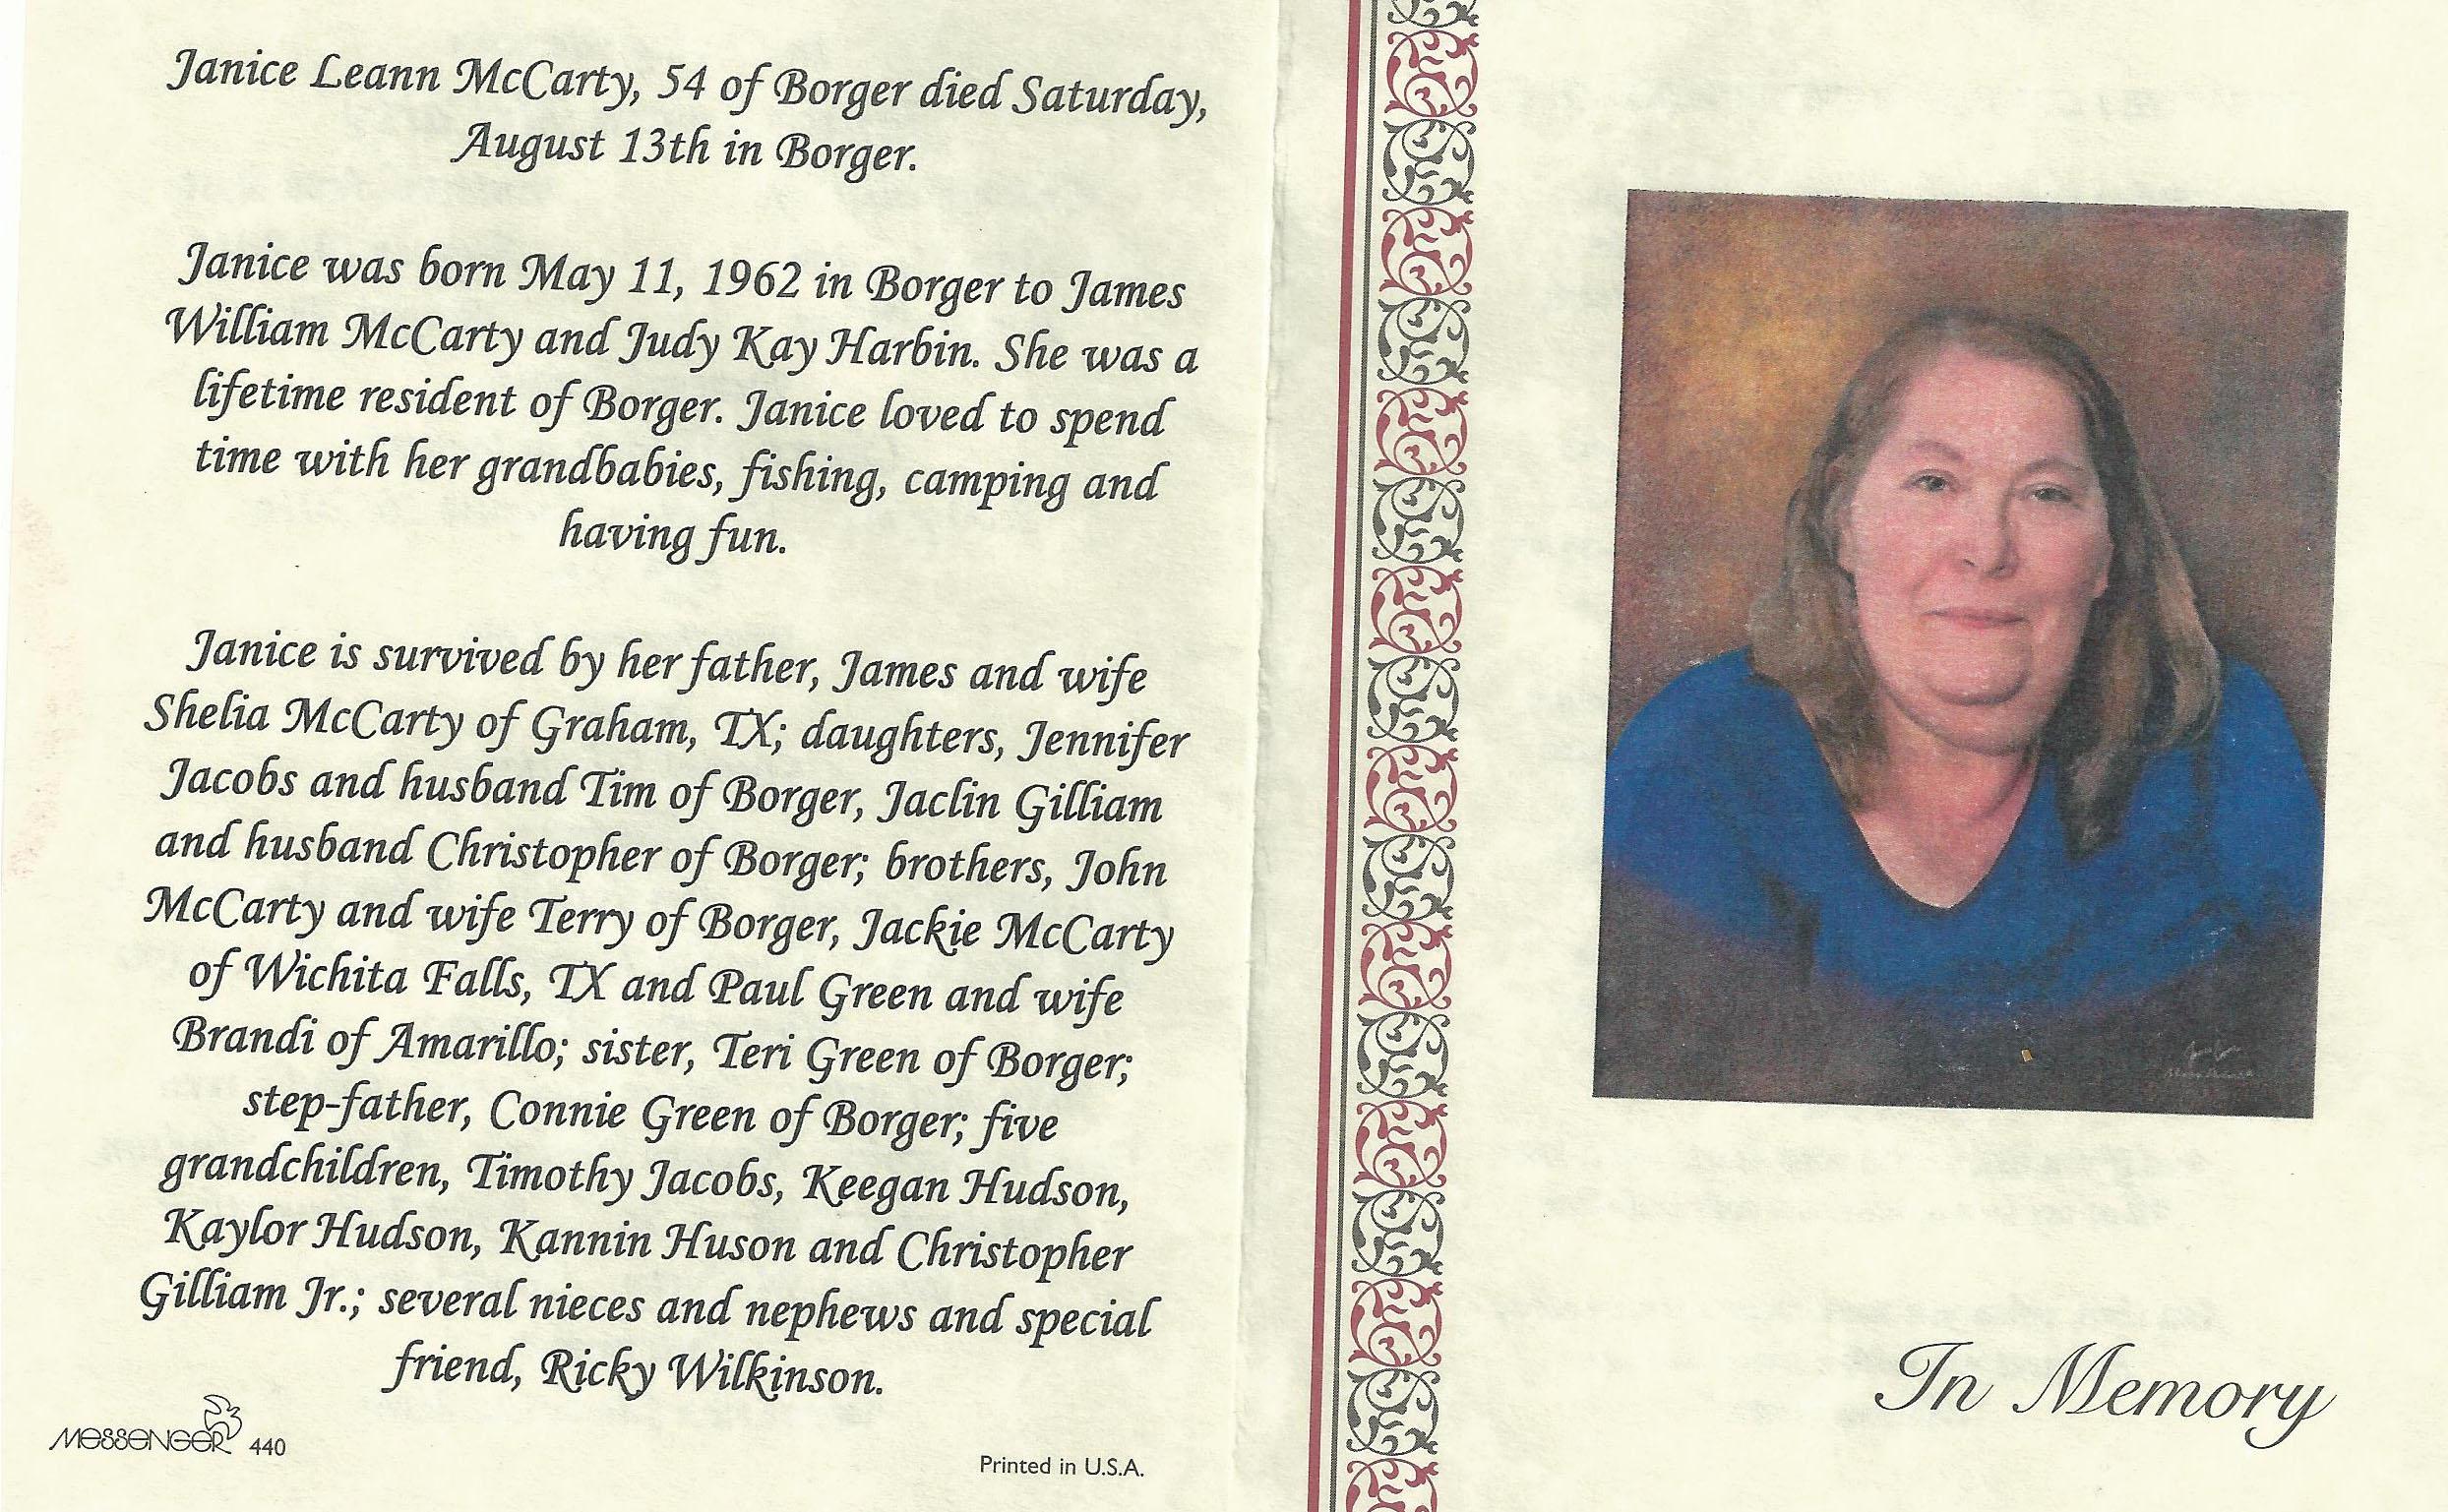 Janice Kay McCarty